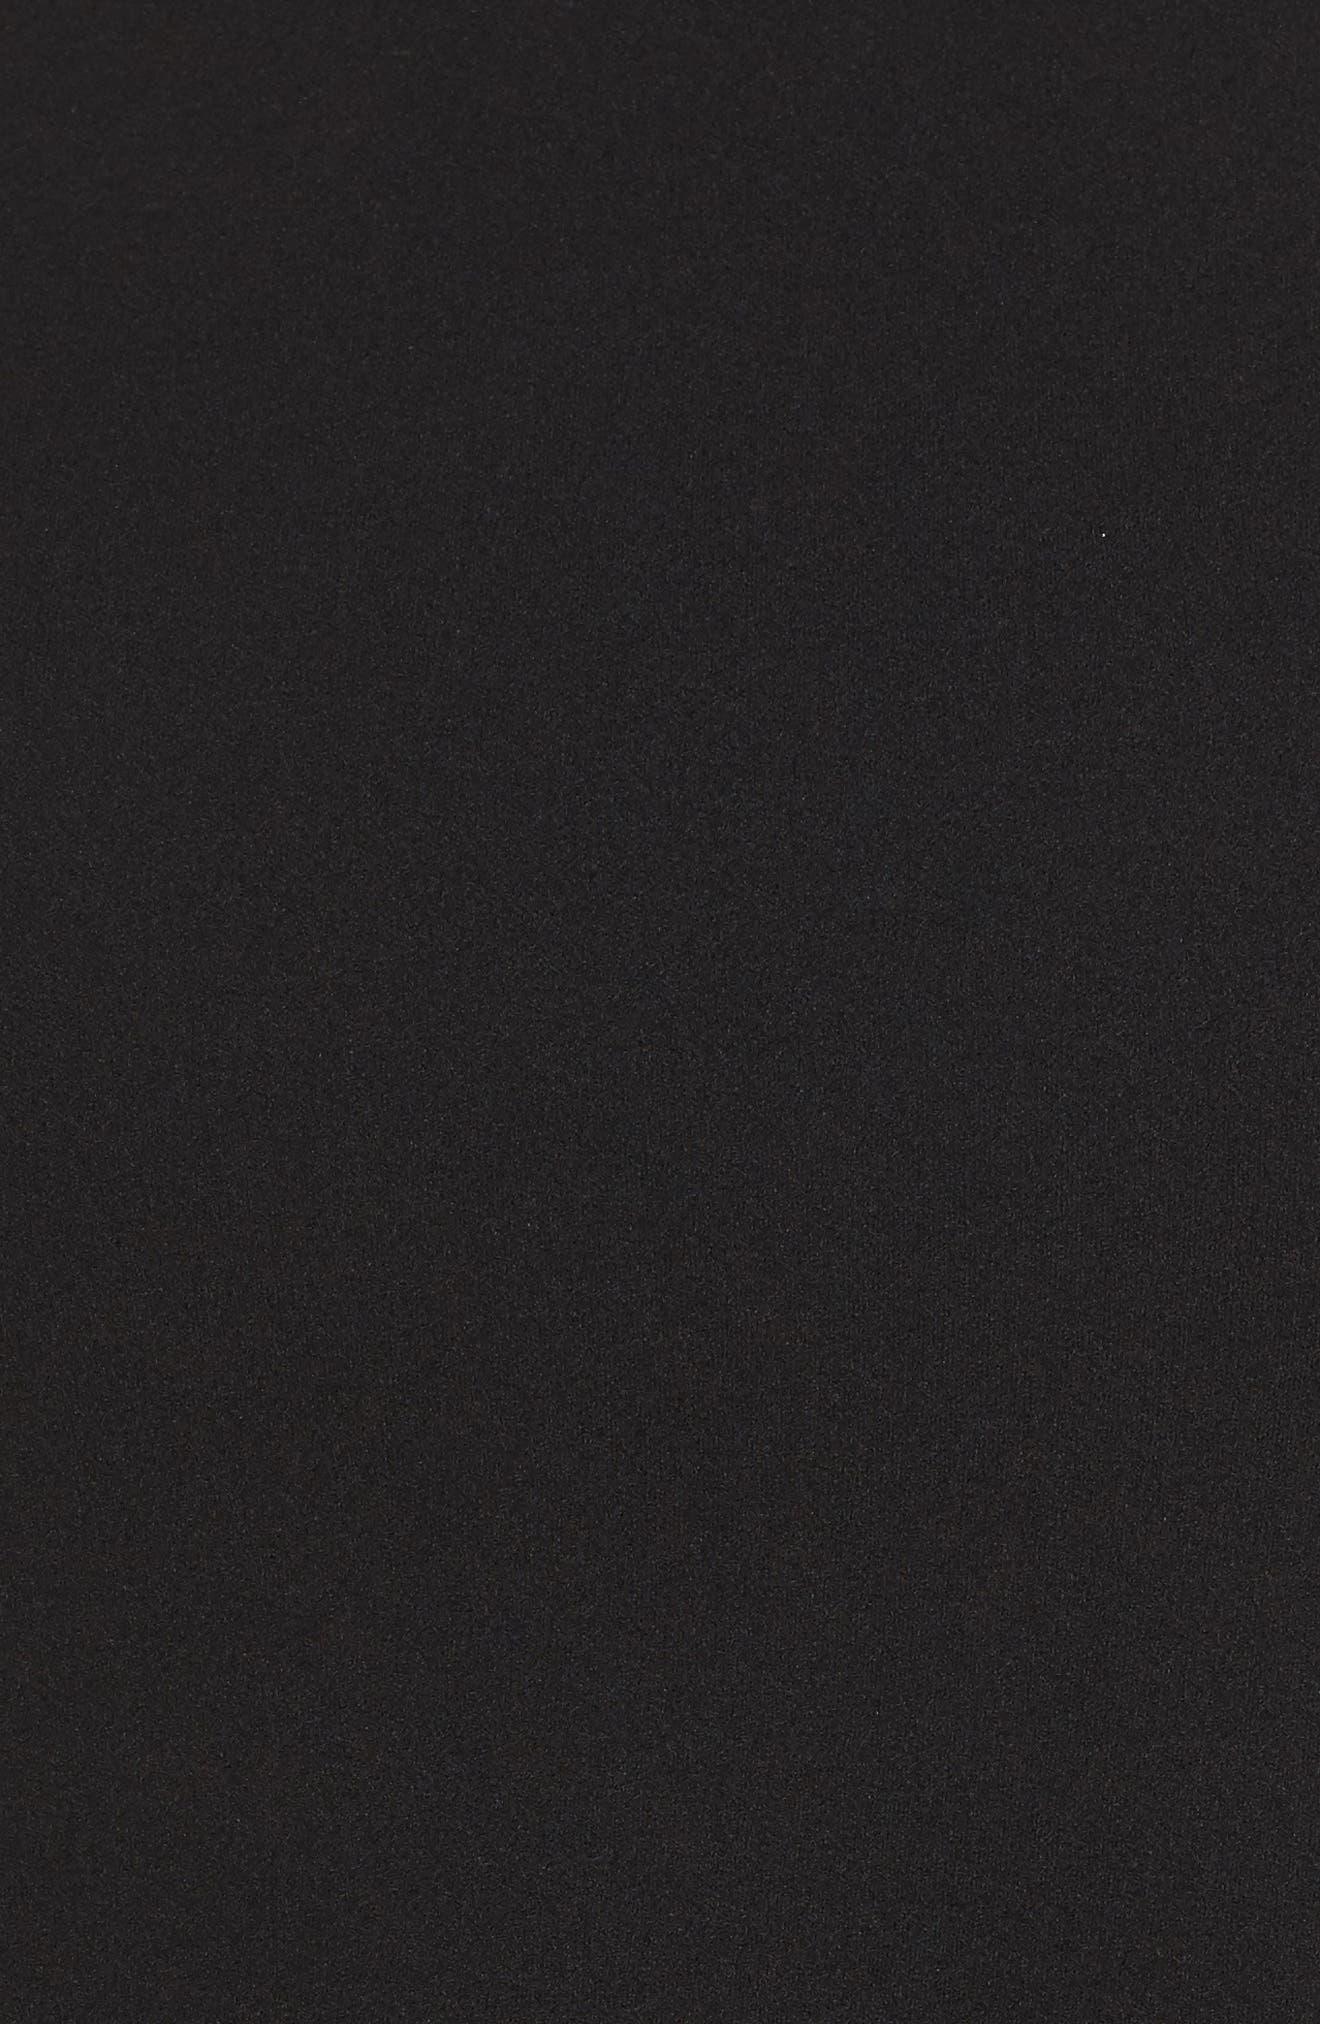 Chiffon Hem Tie Back Top,                             Alternate thumbnail 5, color,                             Black